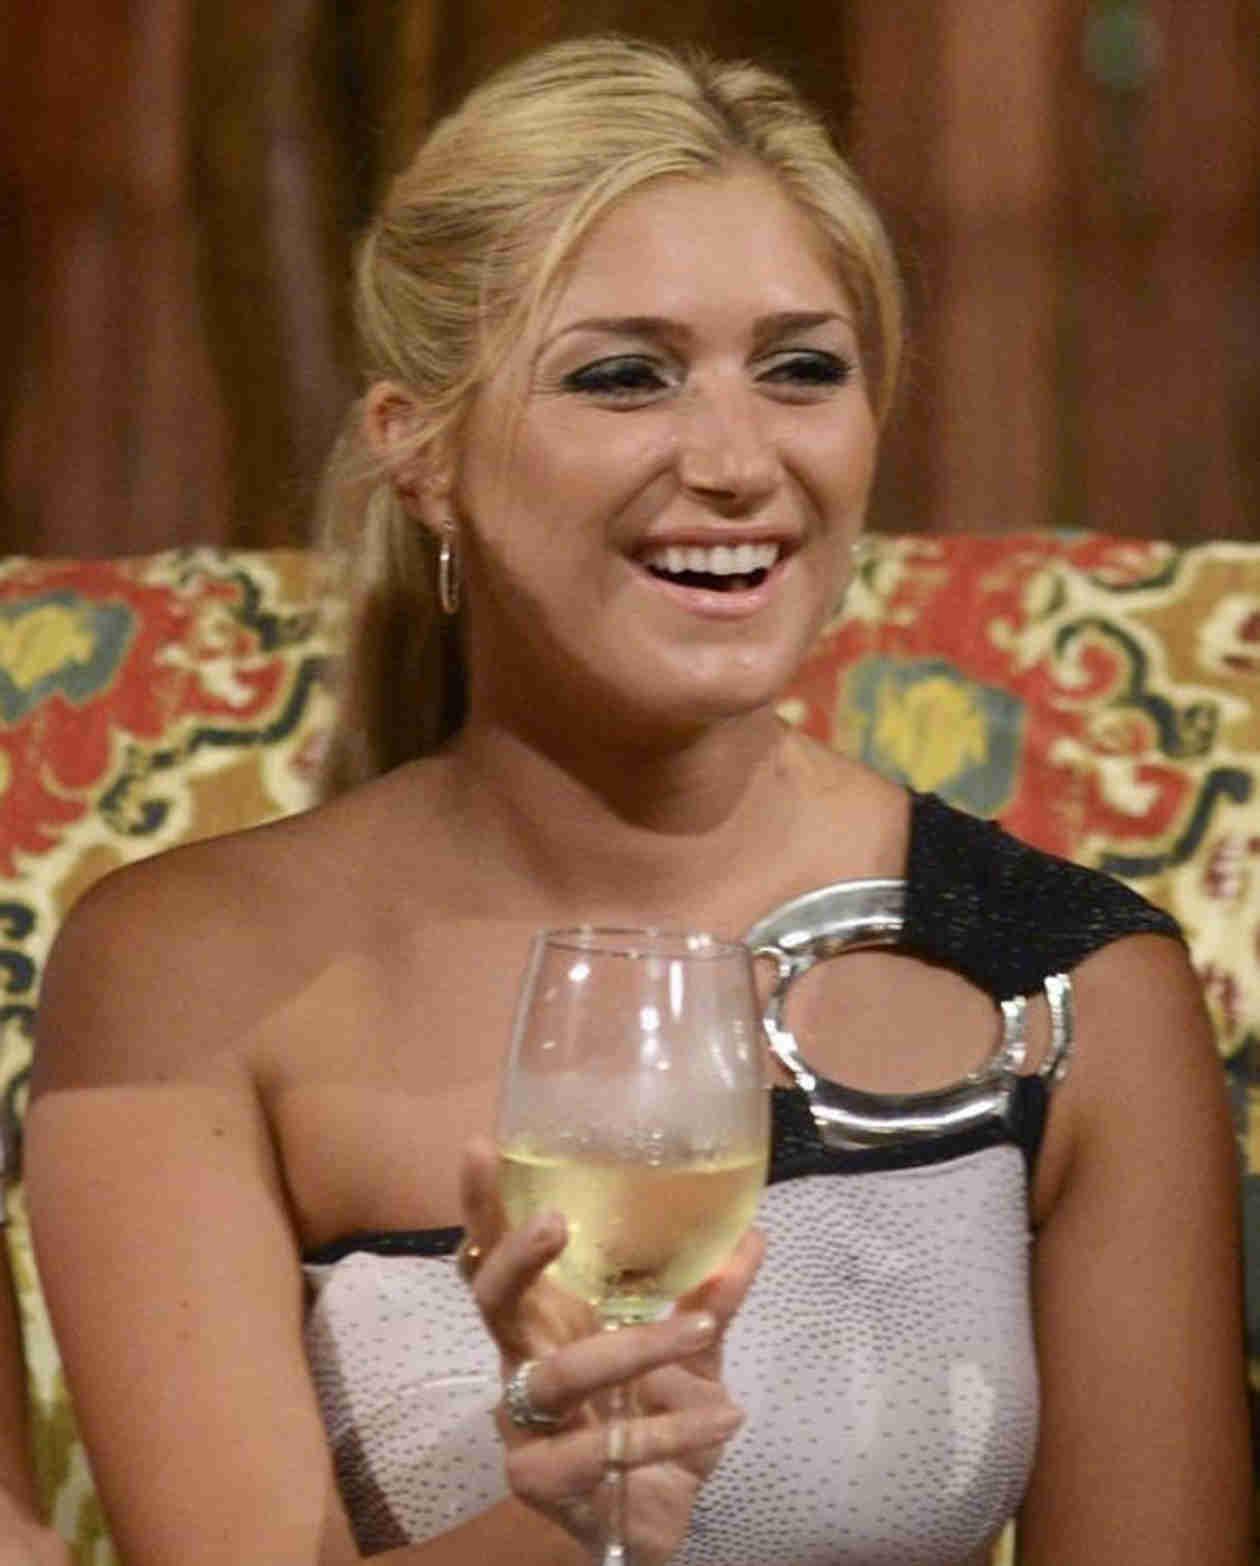 Bachelor in Paradise Episode 2 Twitter Recap: No, Elise Mosca, No!